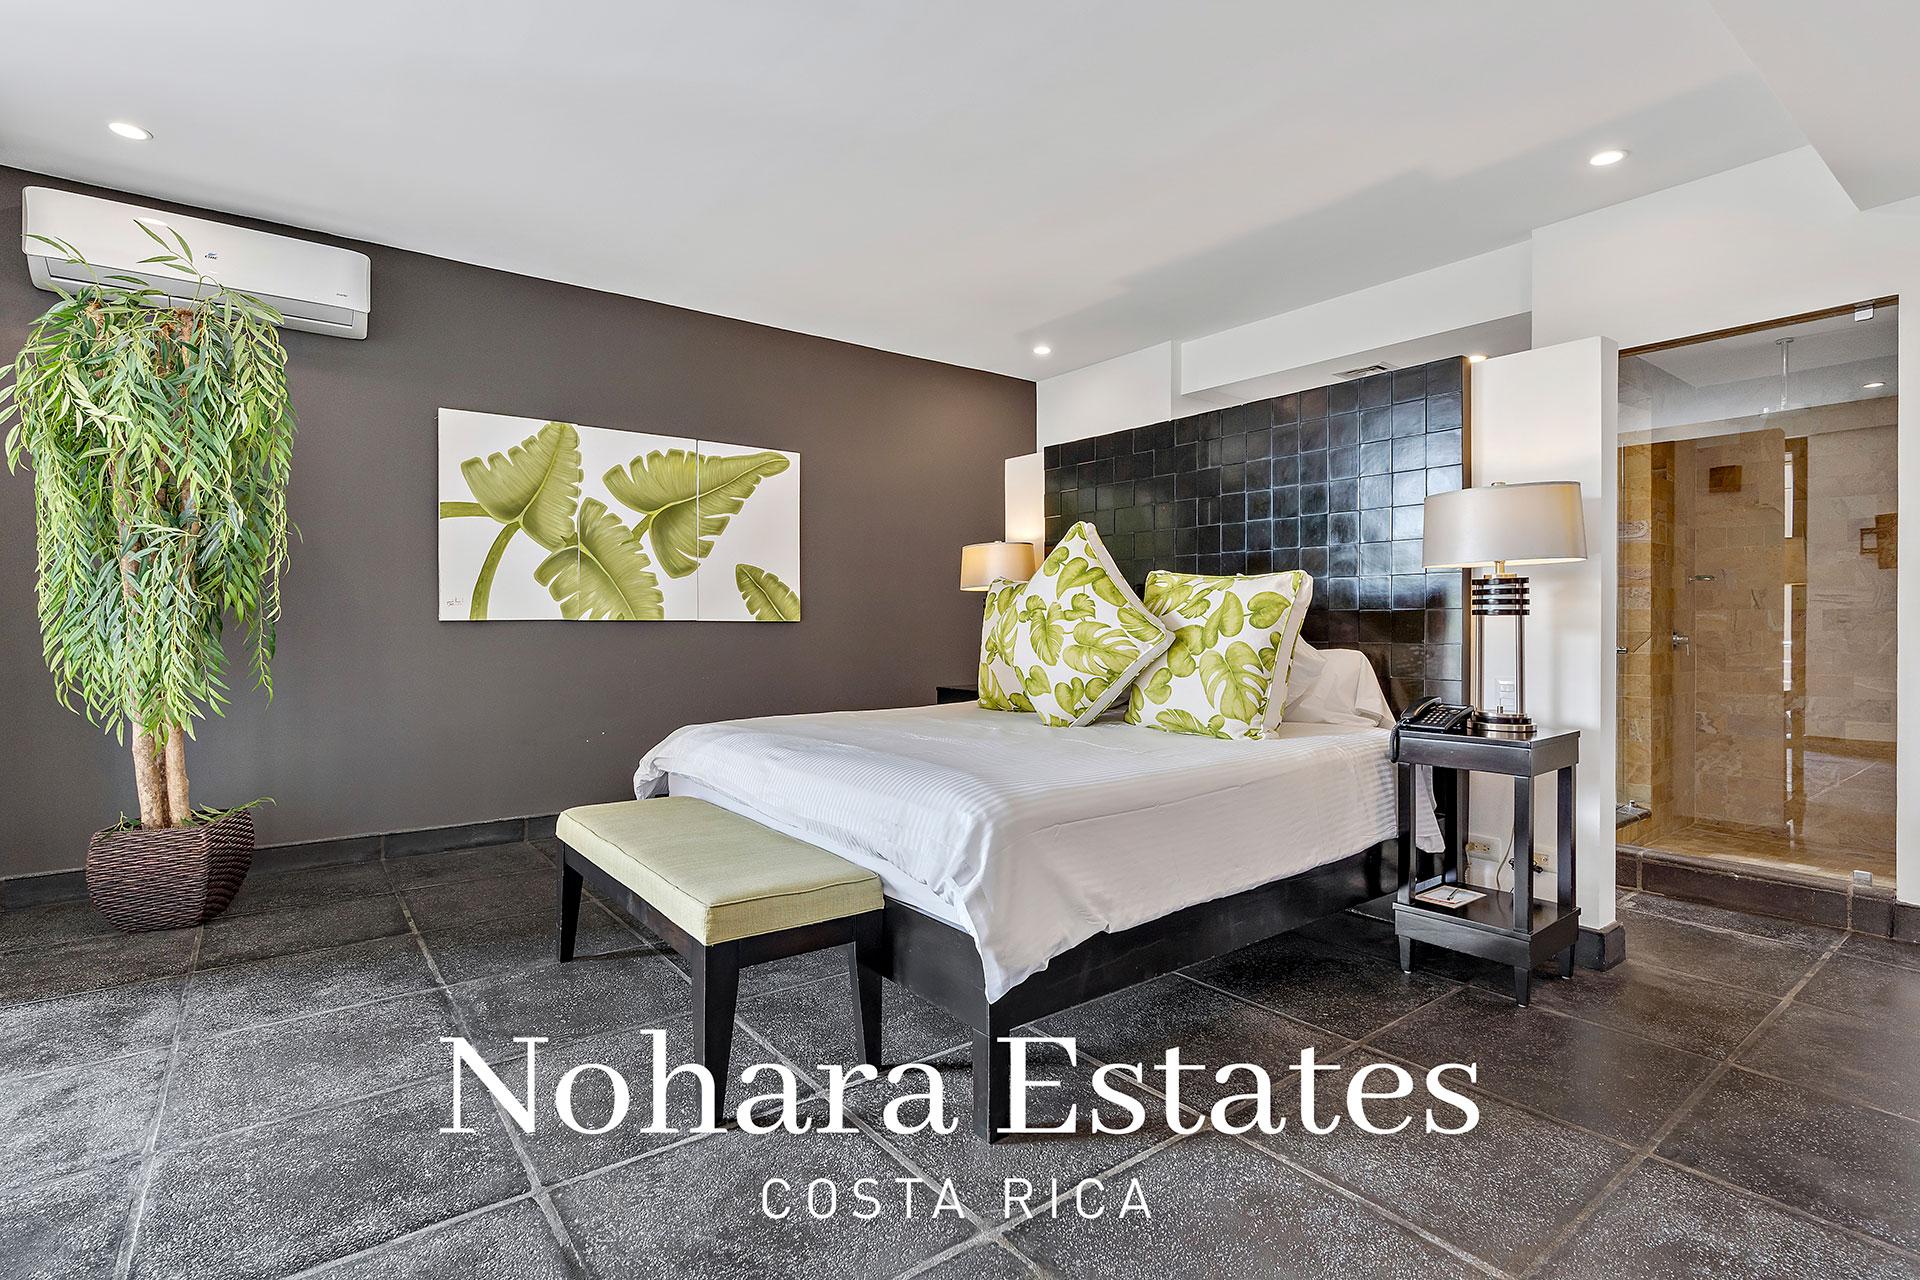 Nohara Estates Costa Rica 128 Penthouse Quepos Los Altos 11